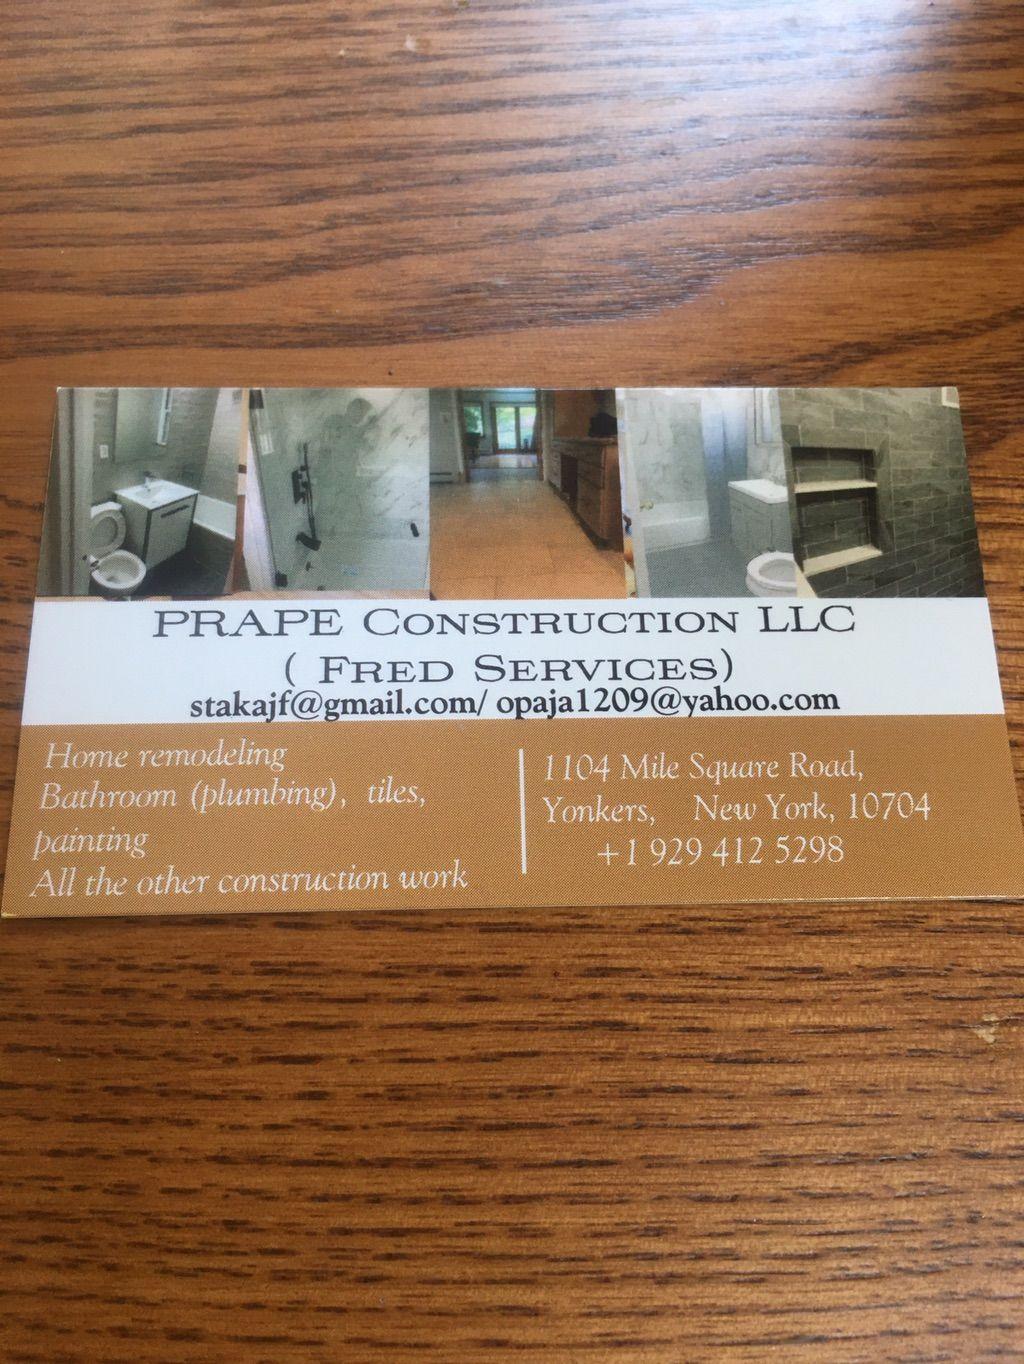 PRAPE CONSTRUCTION LLC- Fred's services